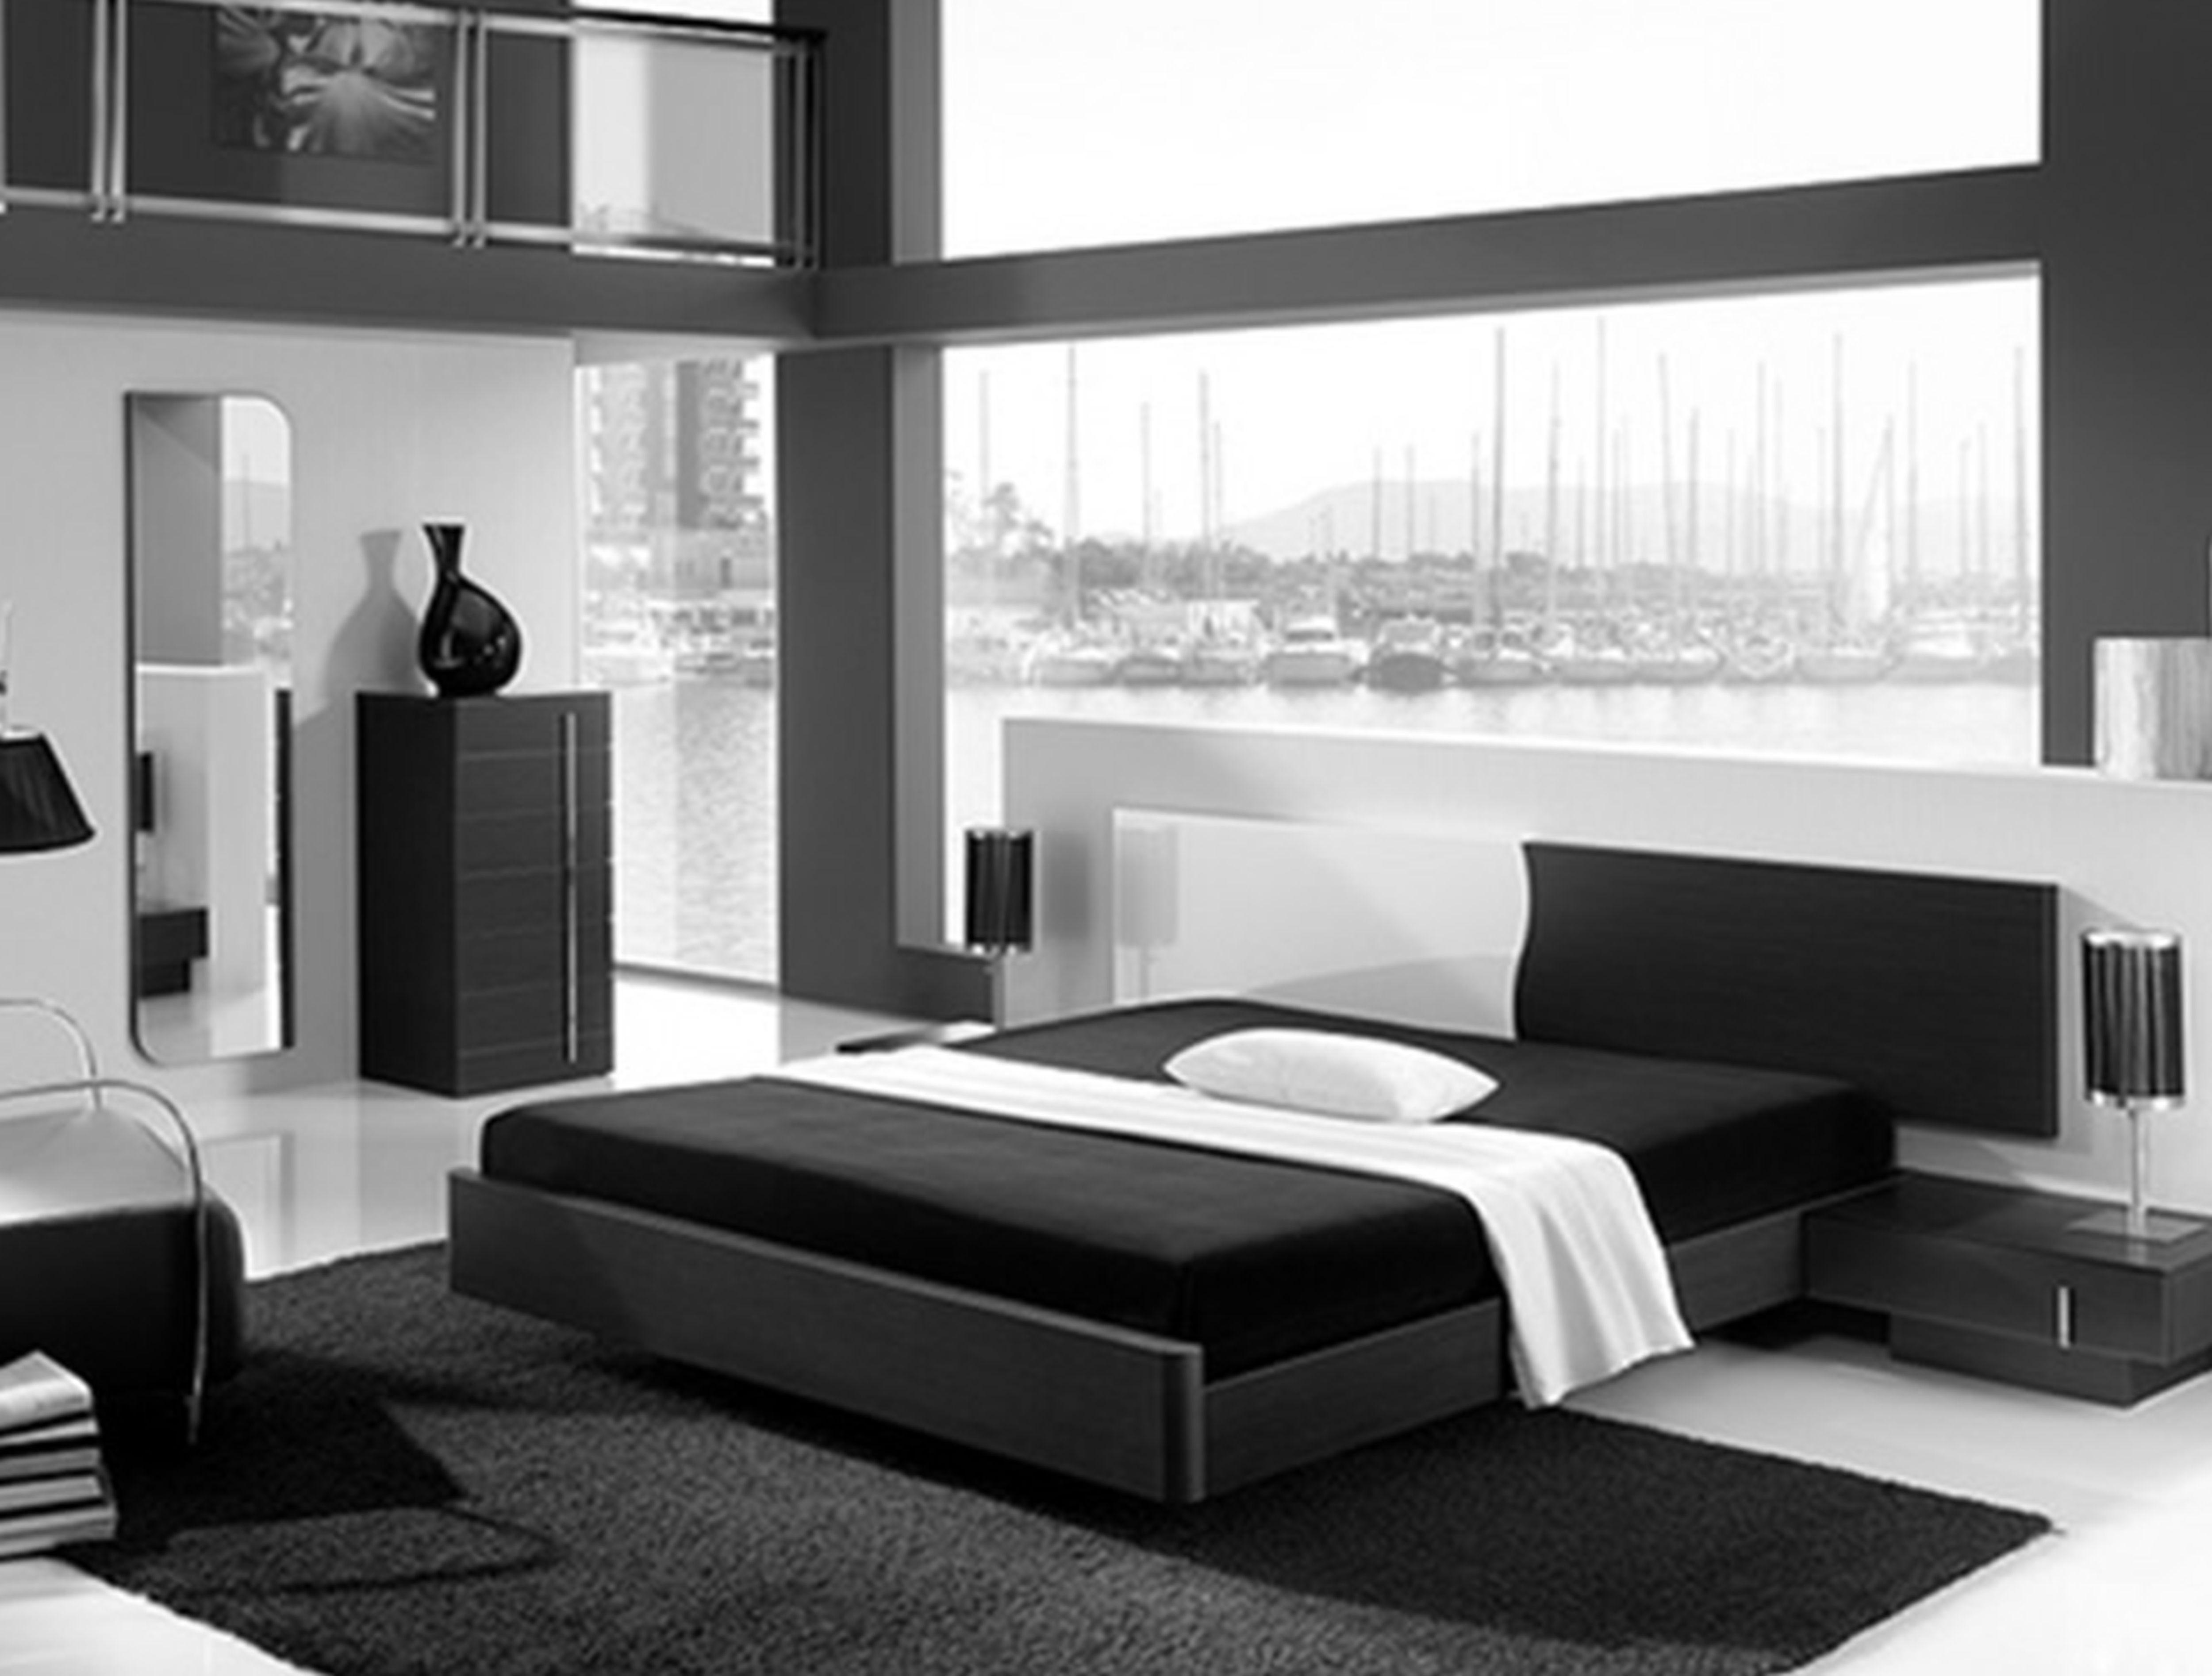 Black Contemporary Bedroom Set Alluring Black And White Modern Bedroom Furniture  Inspiring Home Design Inspiration